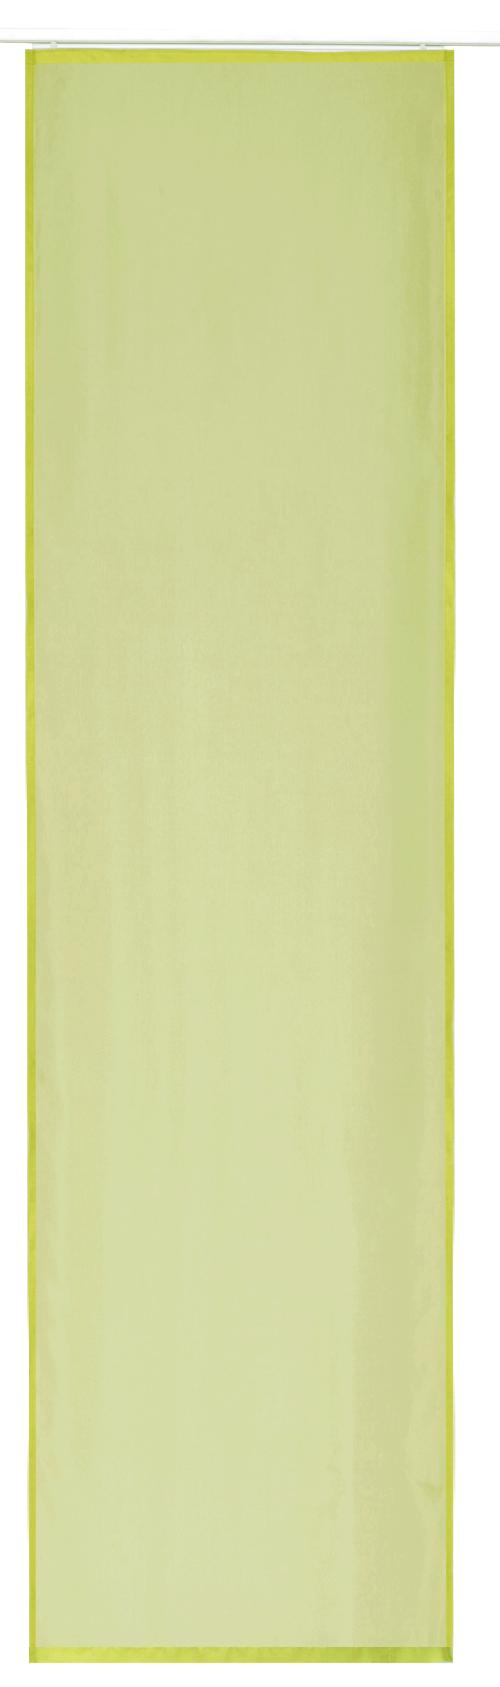 Flächenvorhang Elbersdrucke  Basic grün